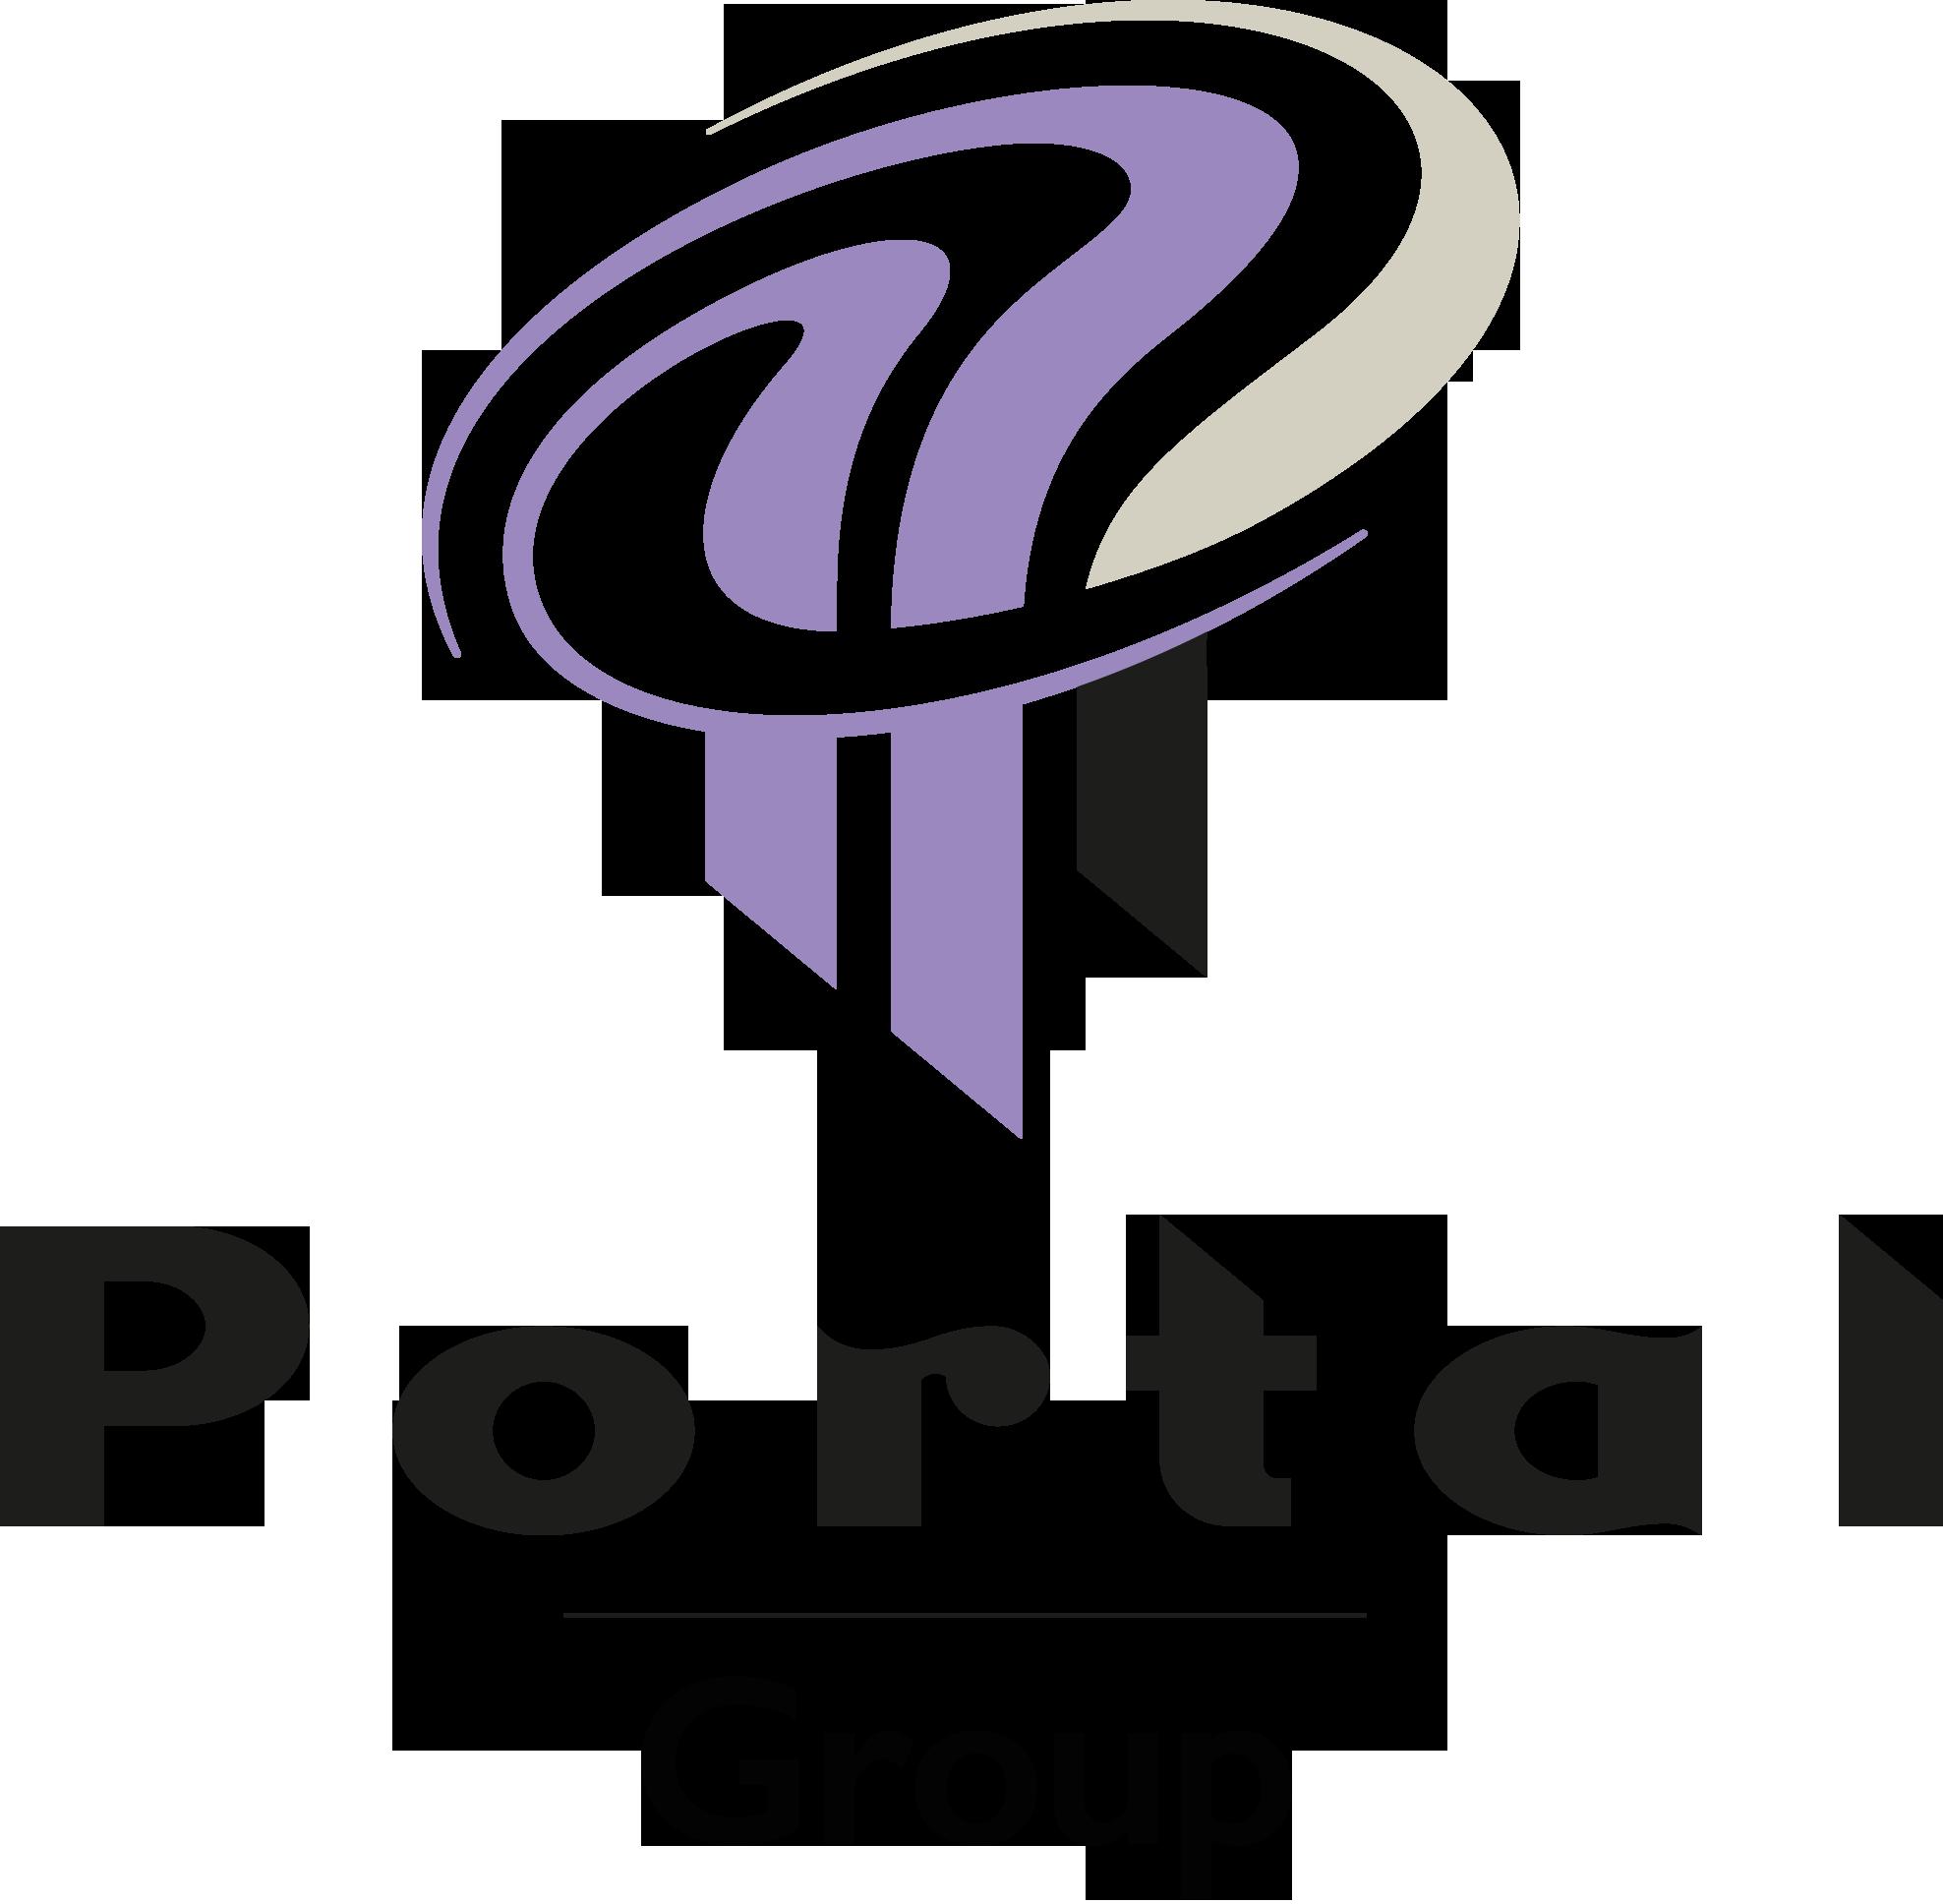 Portal S.r.l. Group